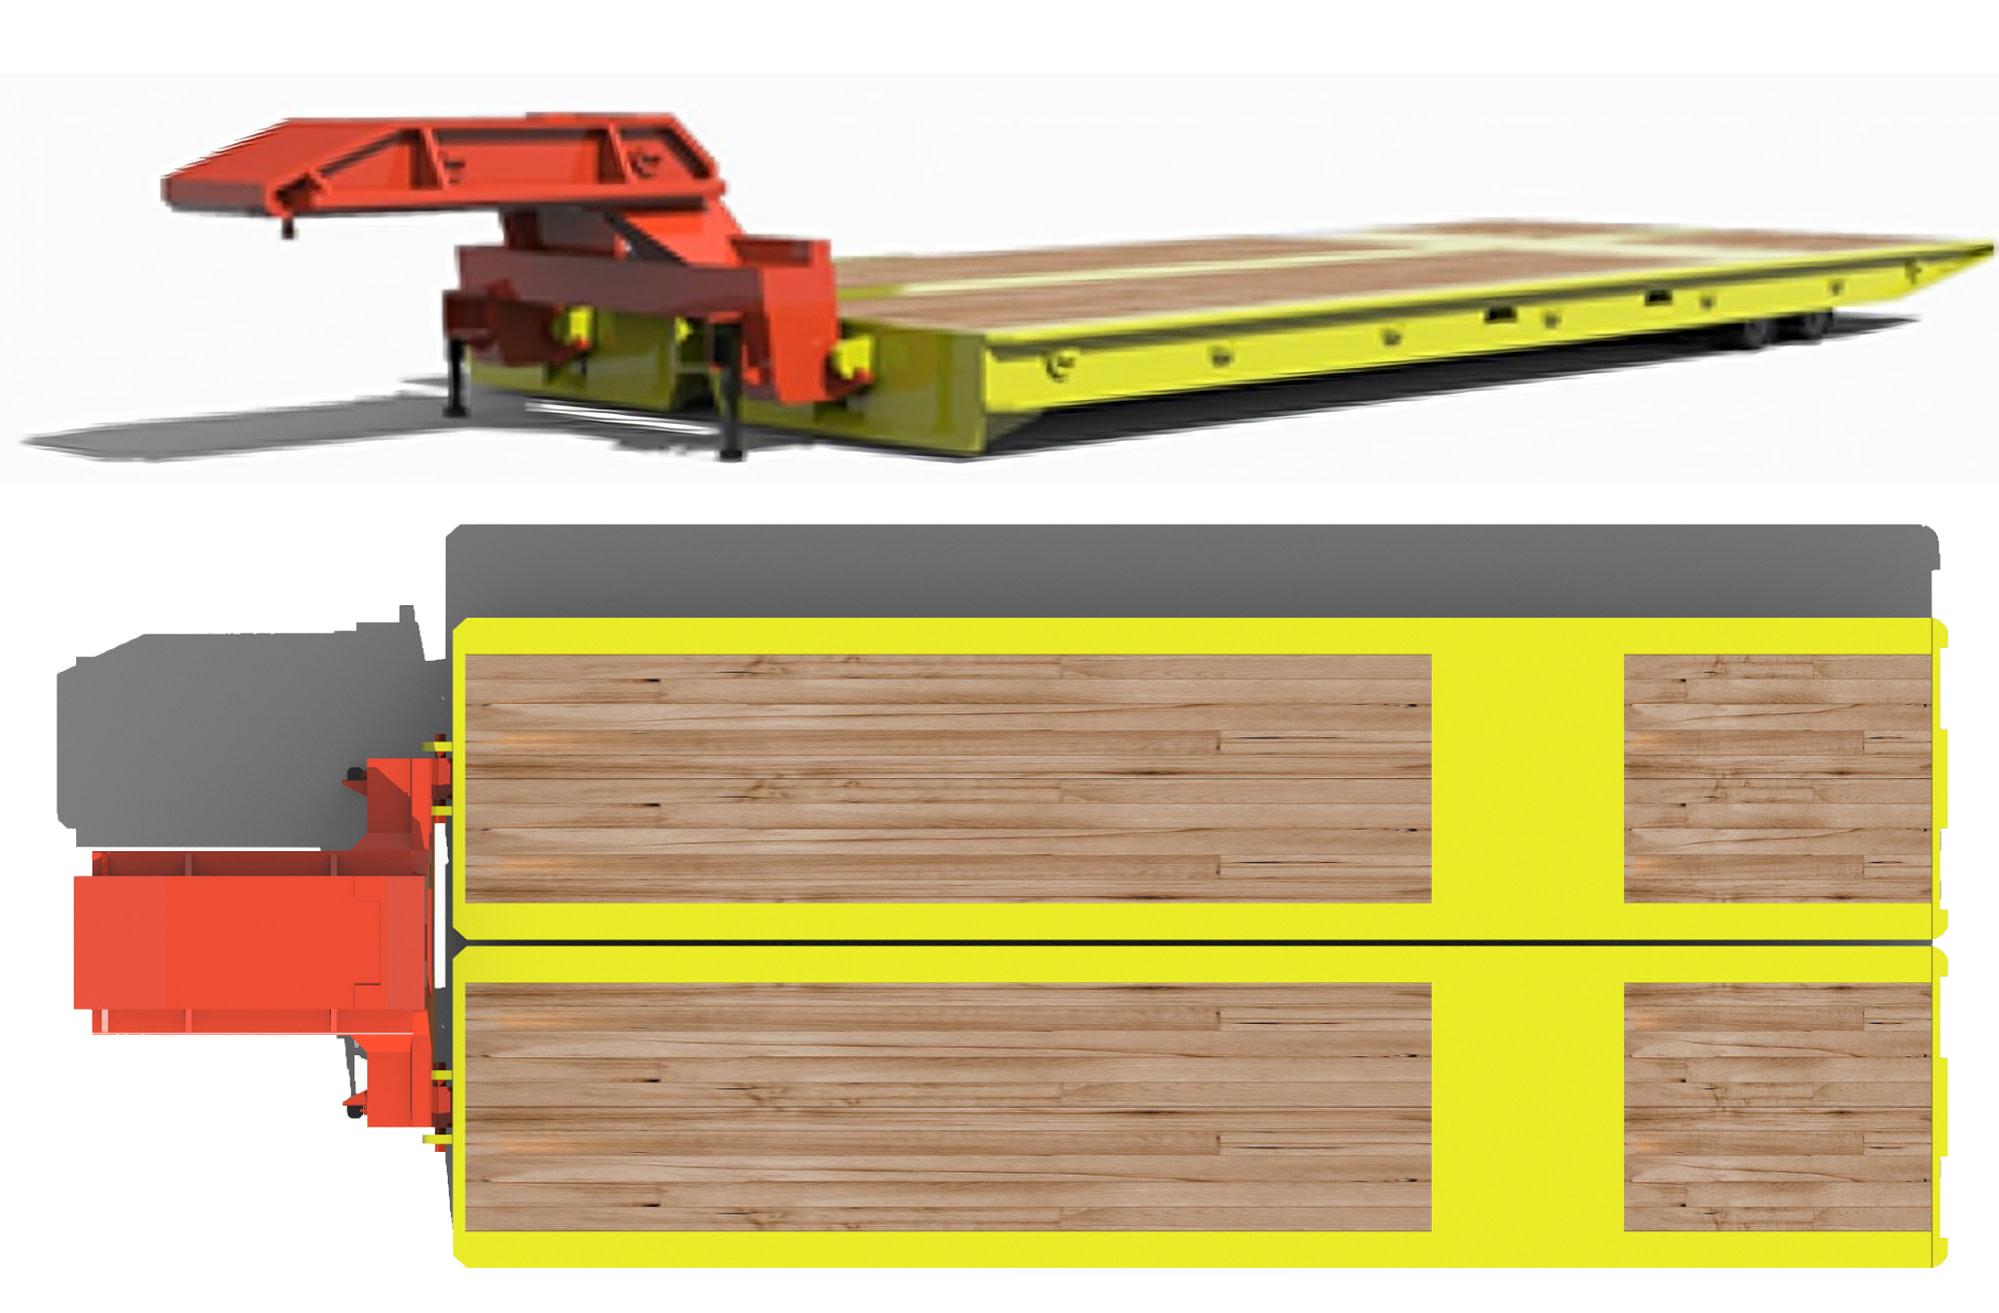 break bulk cargo,break bulk shipping,mafi trailers,rolltrailers